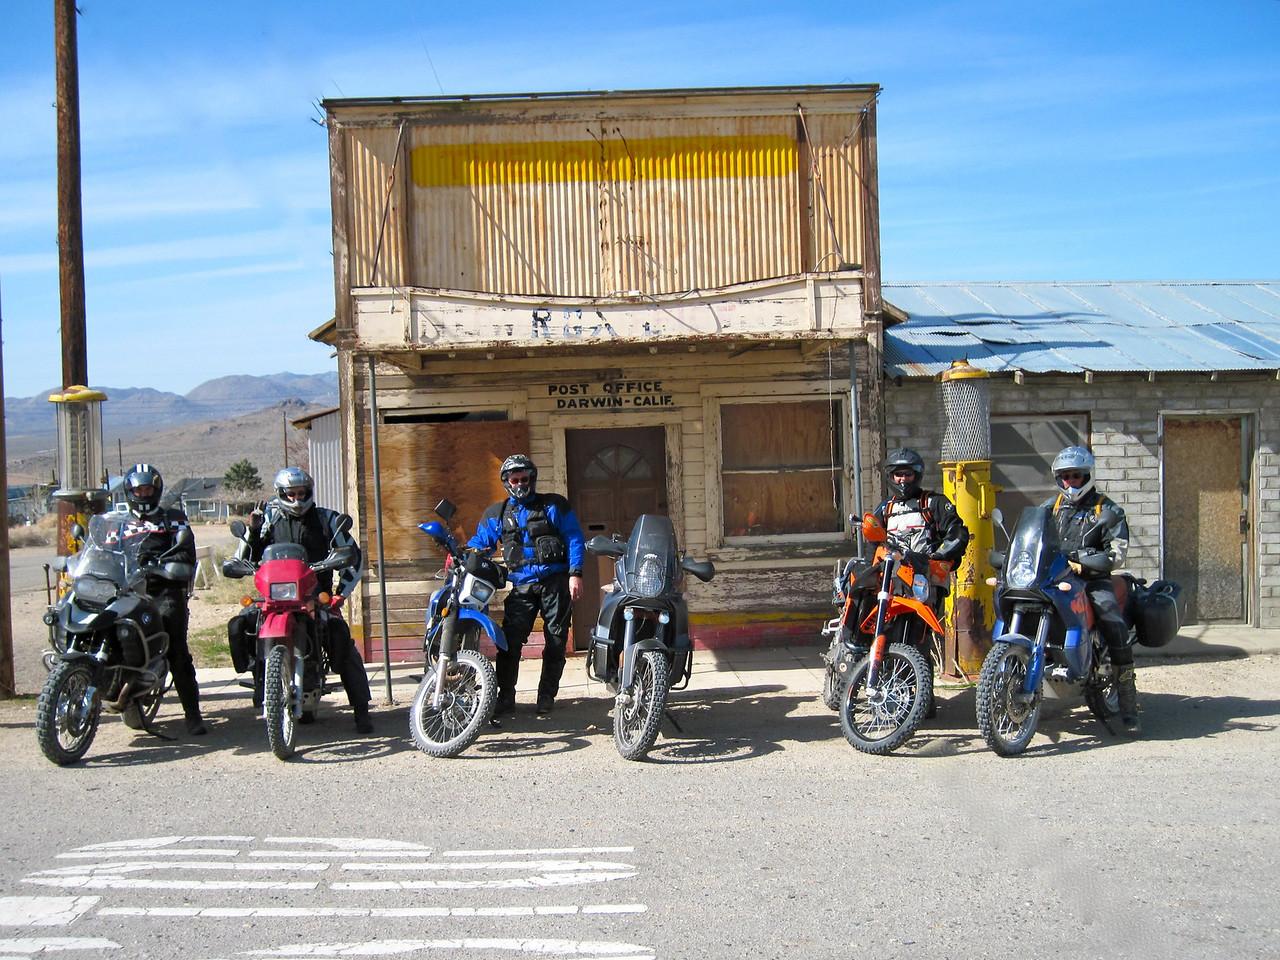 The town of Darwin in the California desert